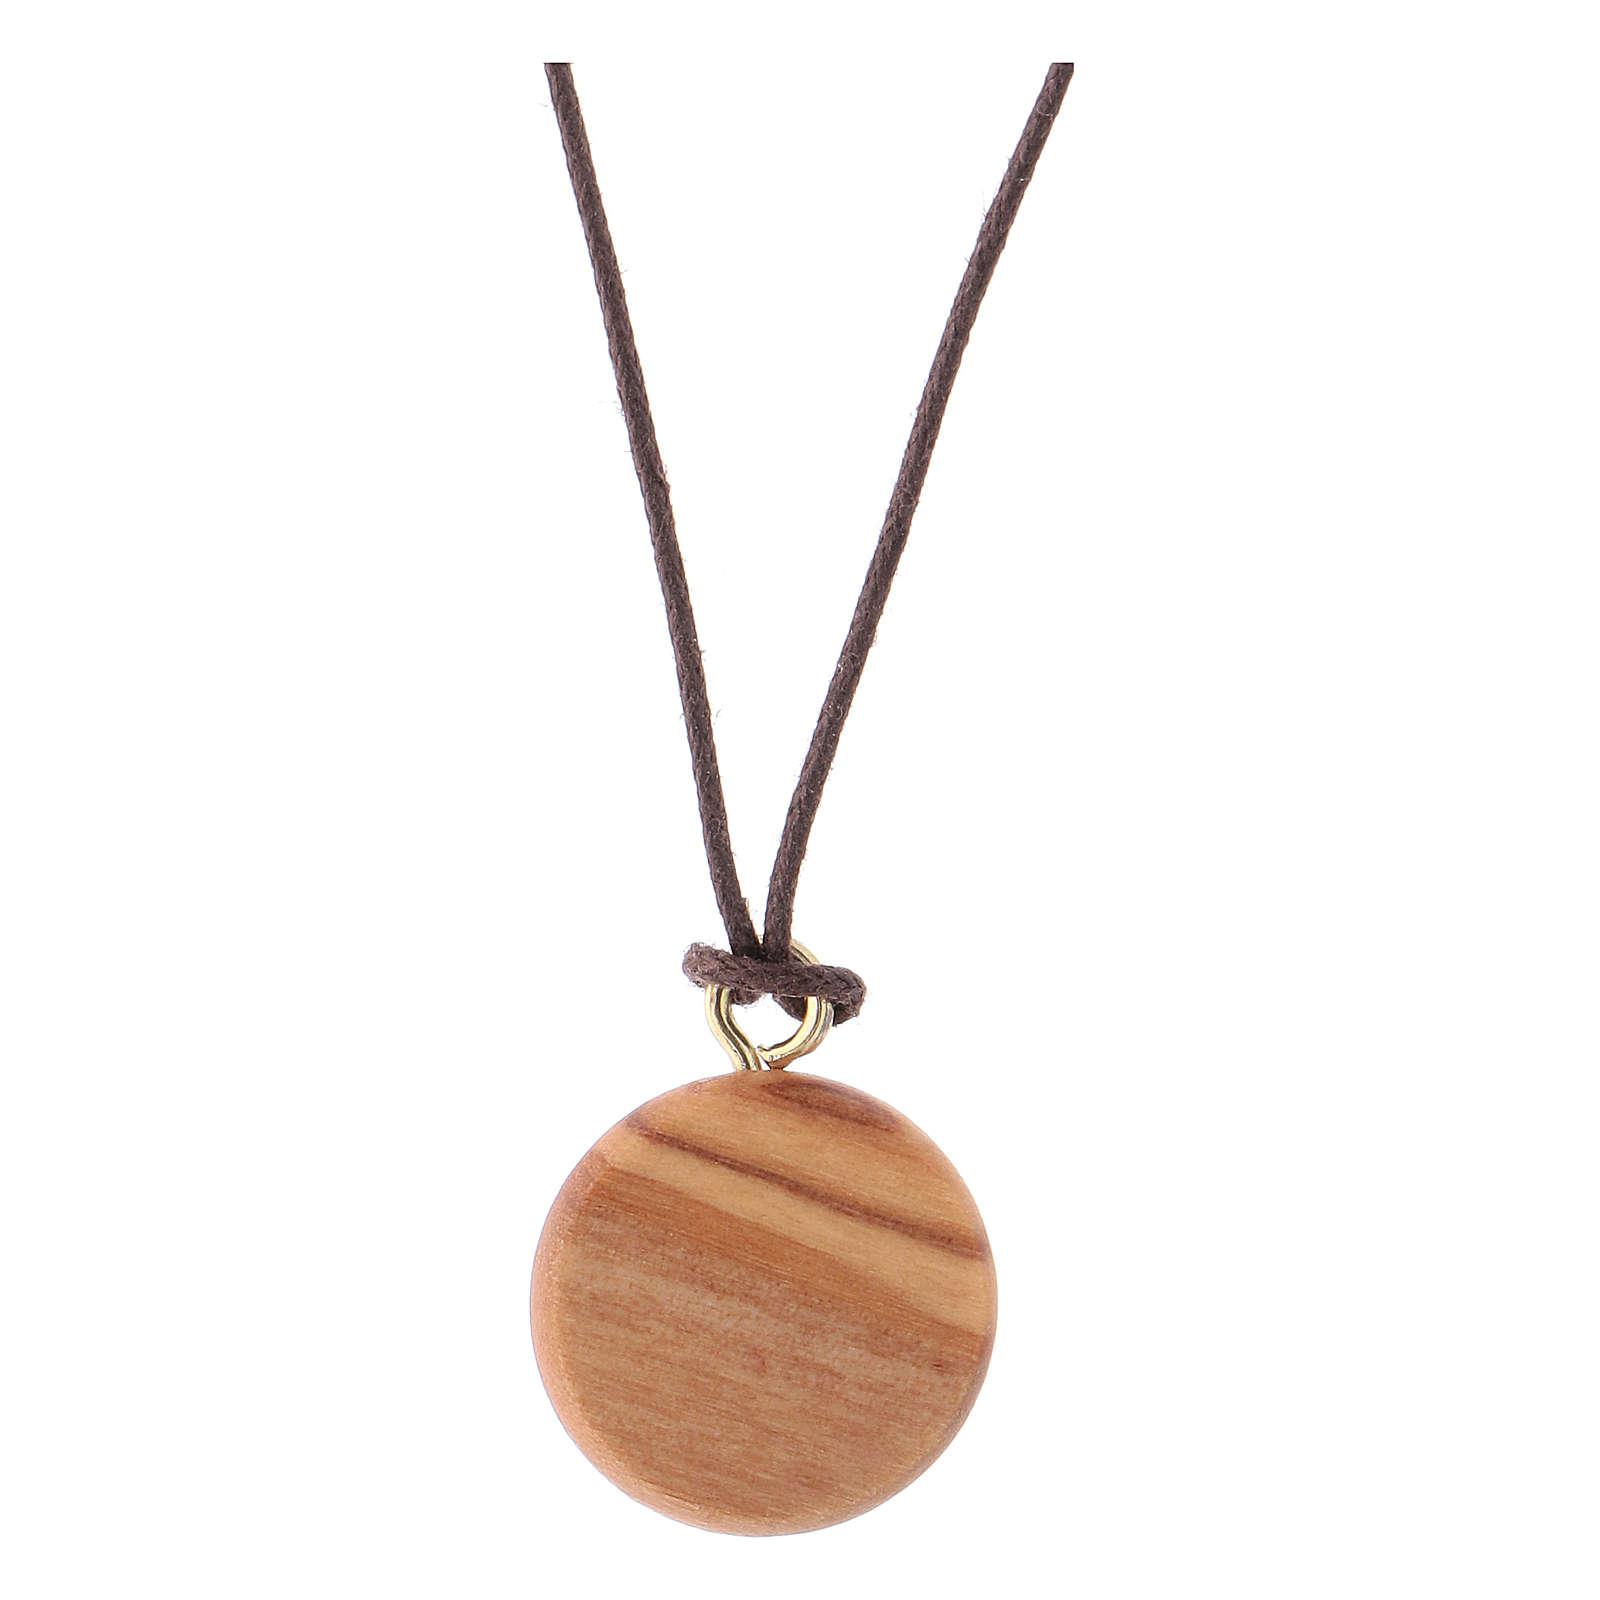 Medaglia legno olivo Gesù Divina Misericordia 4